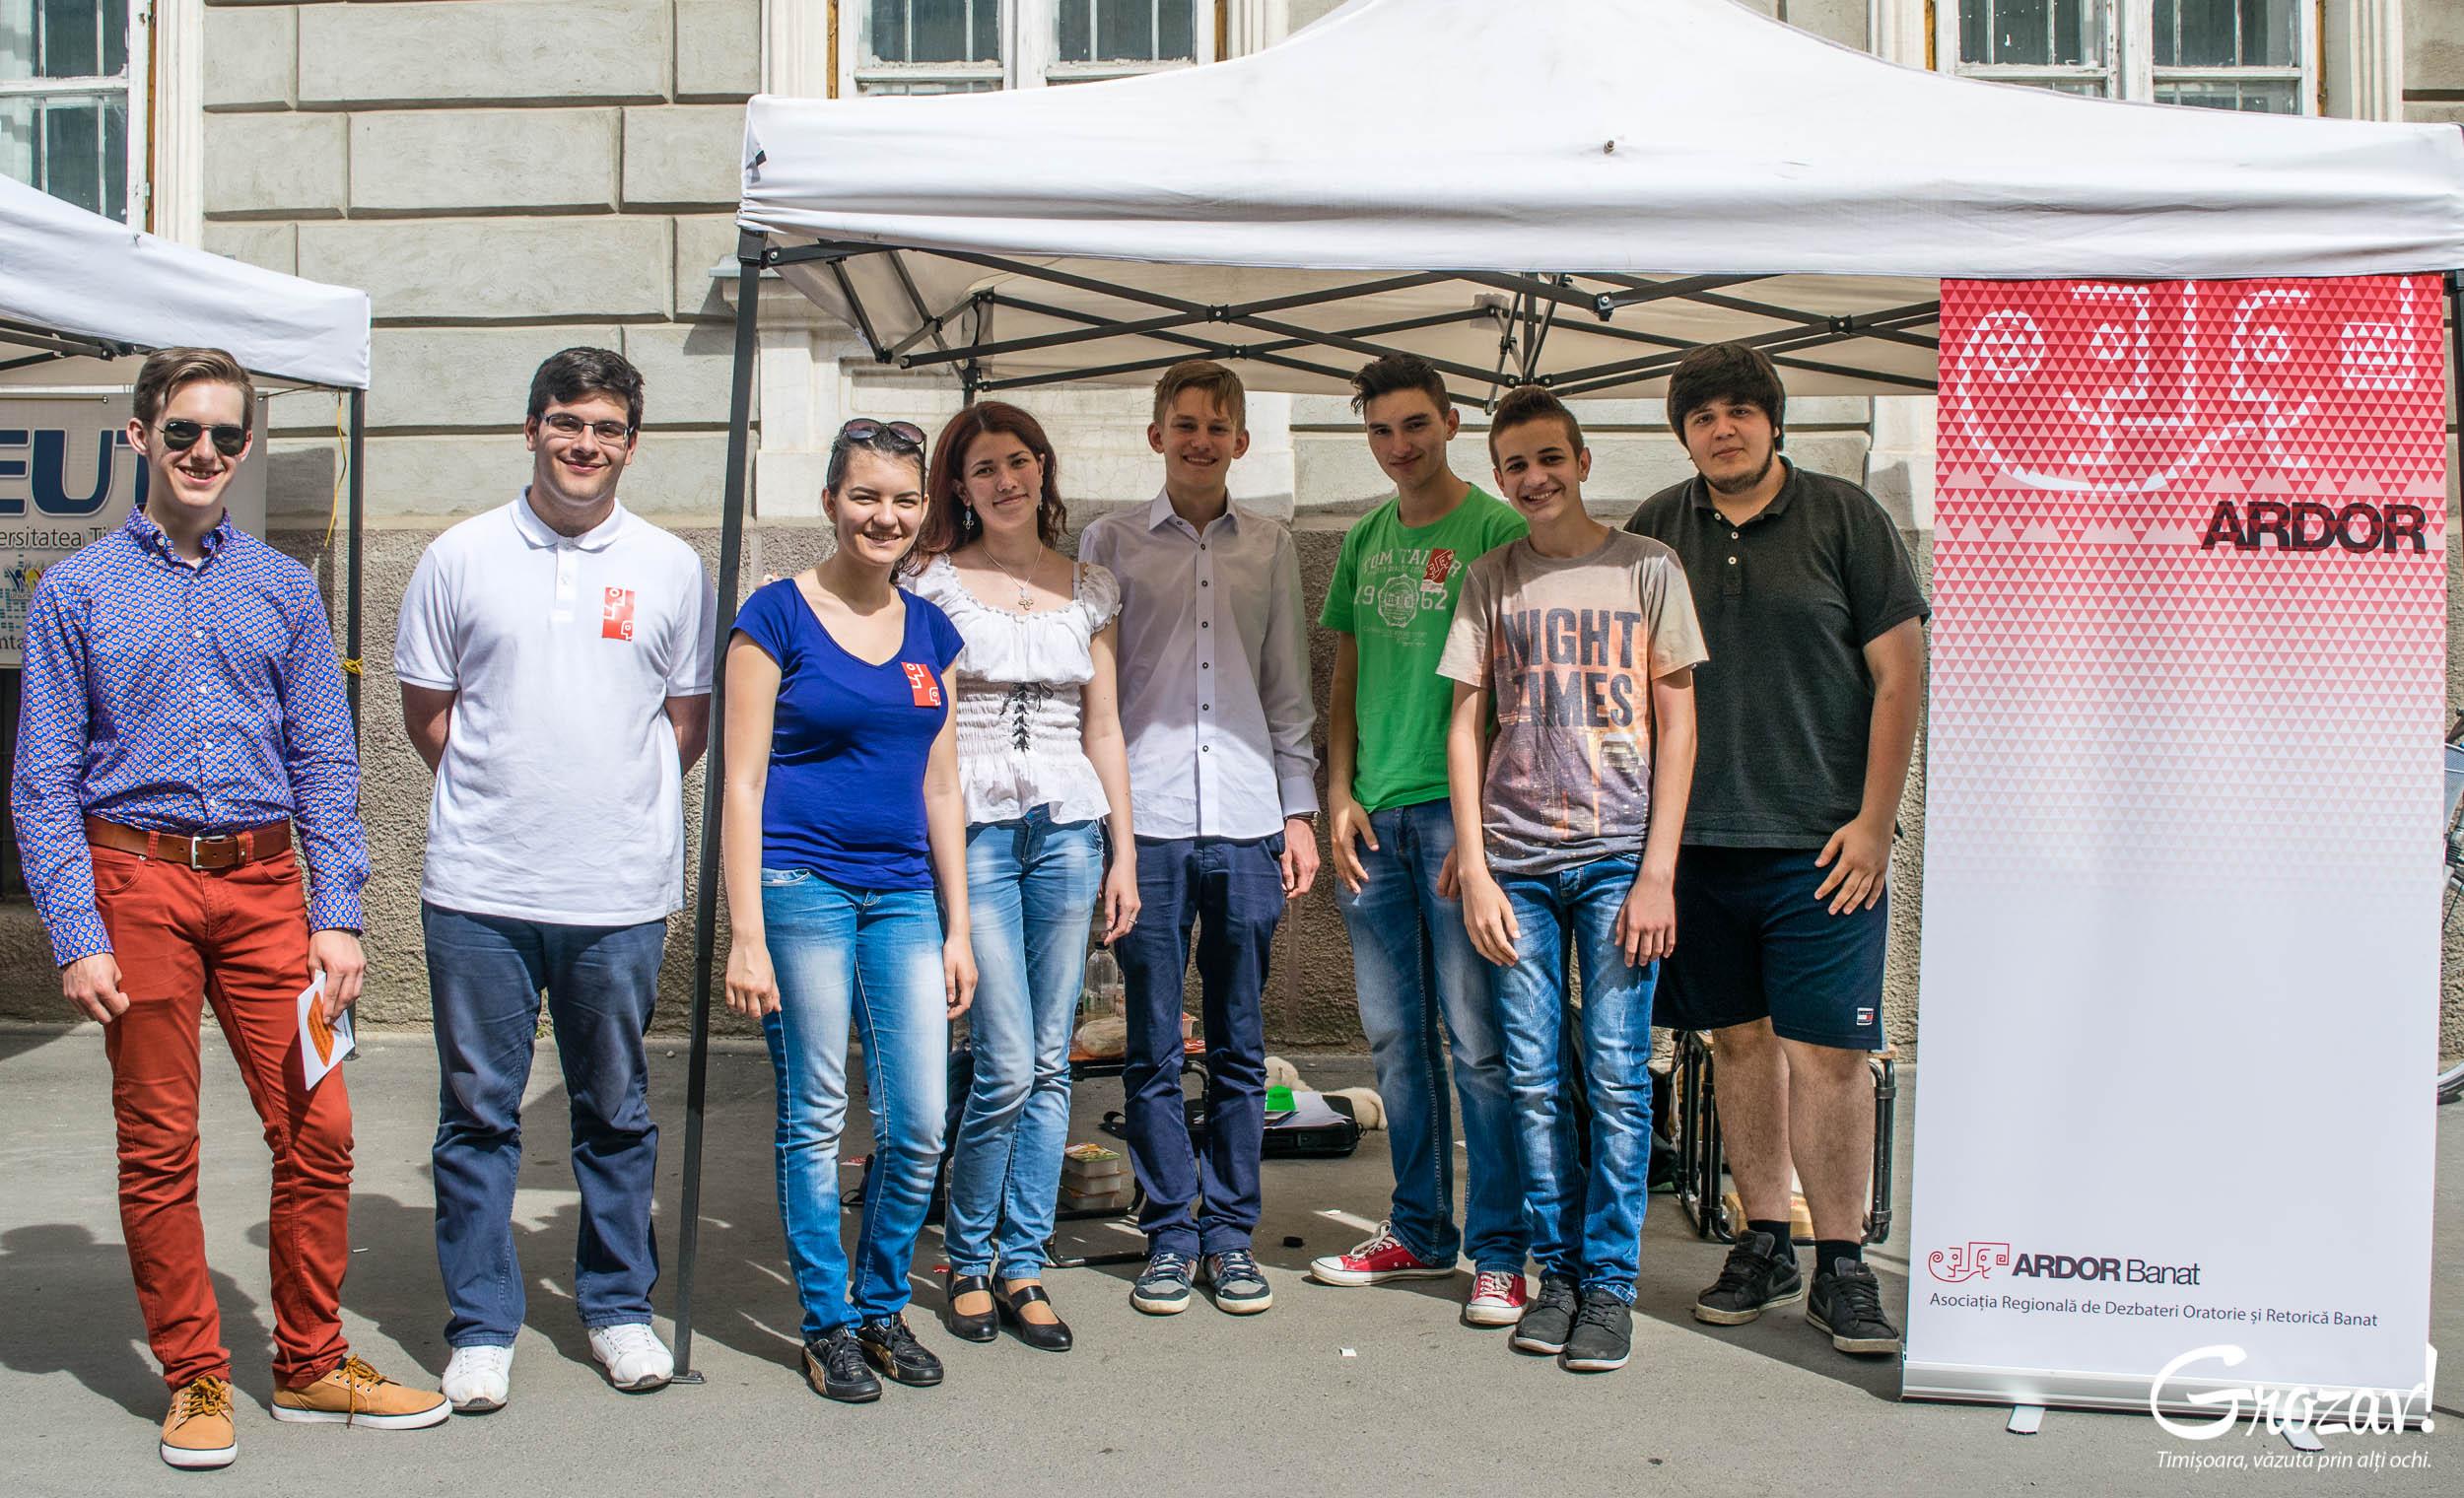 ARDOR Timisoara Targul ONG-urilor grozav